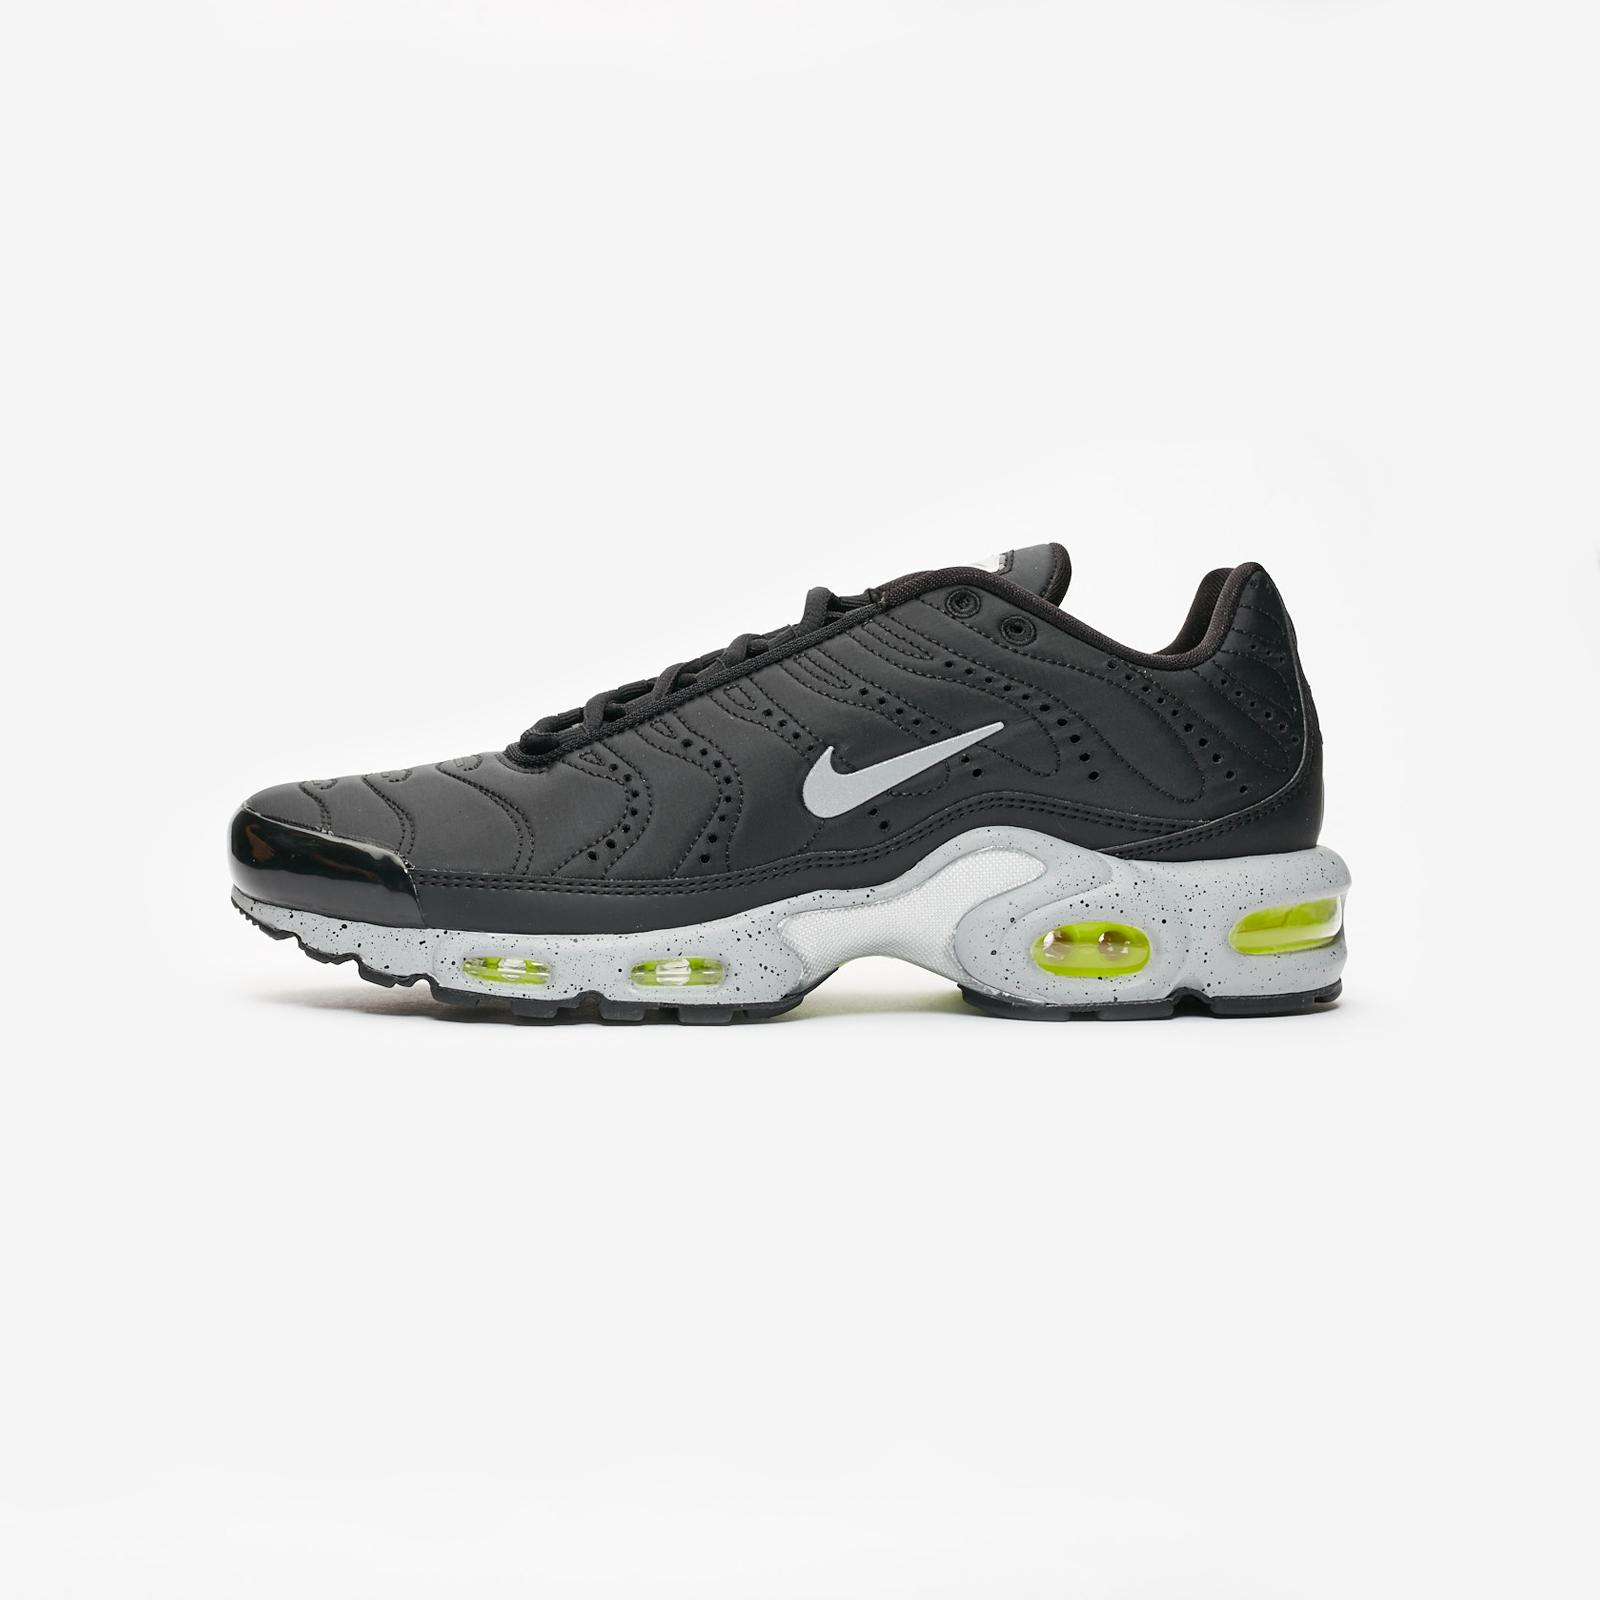 61d6795e49 Nike Air Max Plus Premium - 815994-003 - Sneakersnstuff | sneakers &  streetwear online since 1999